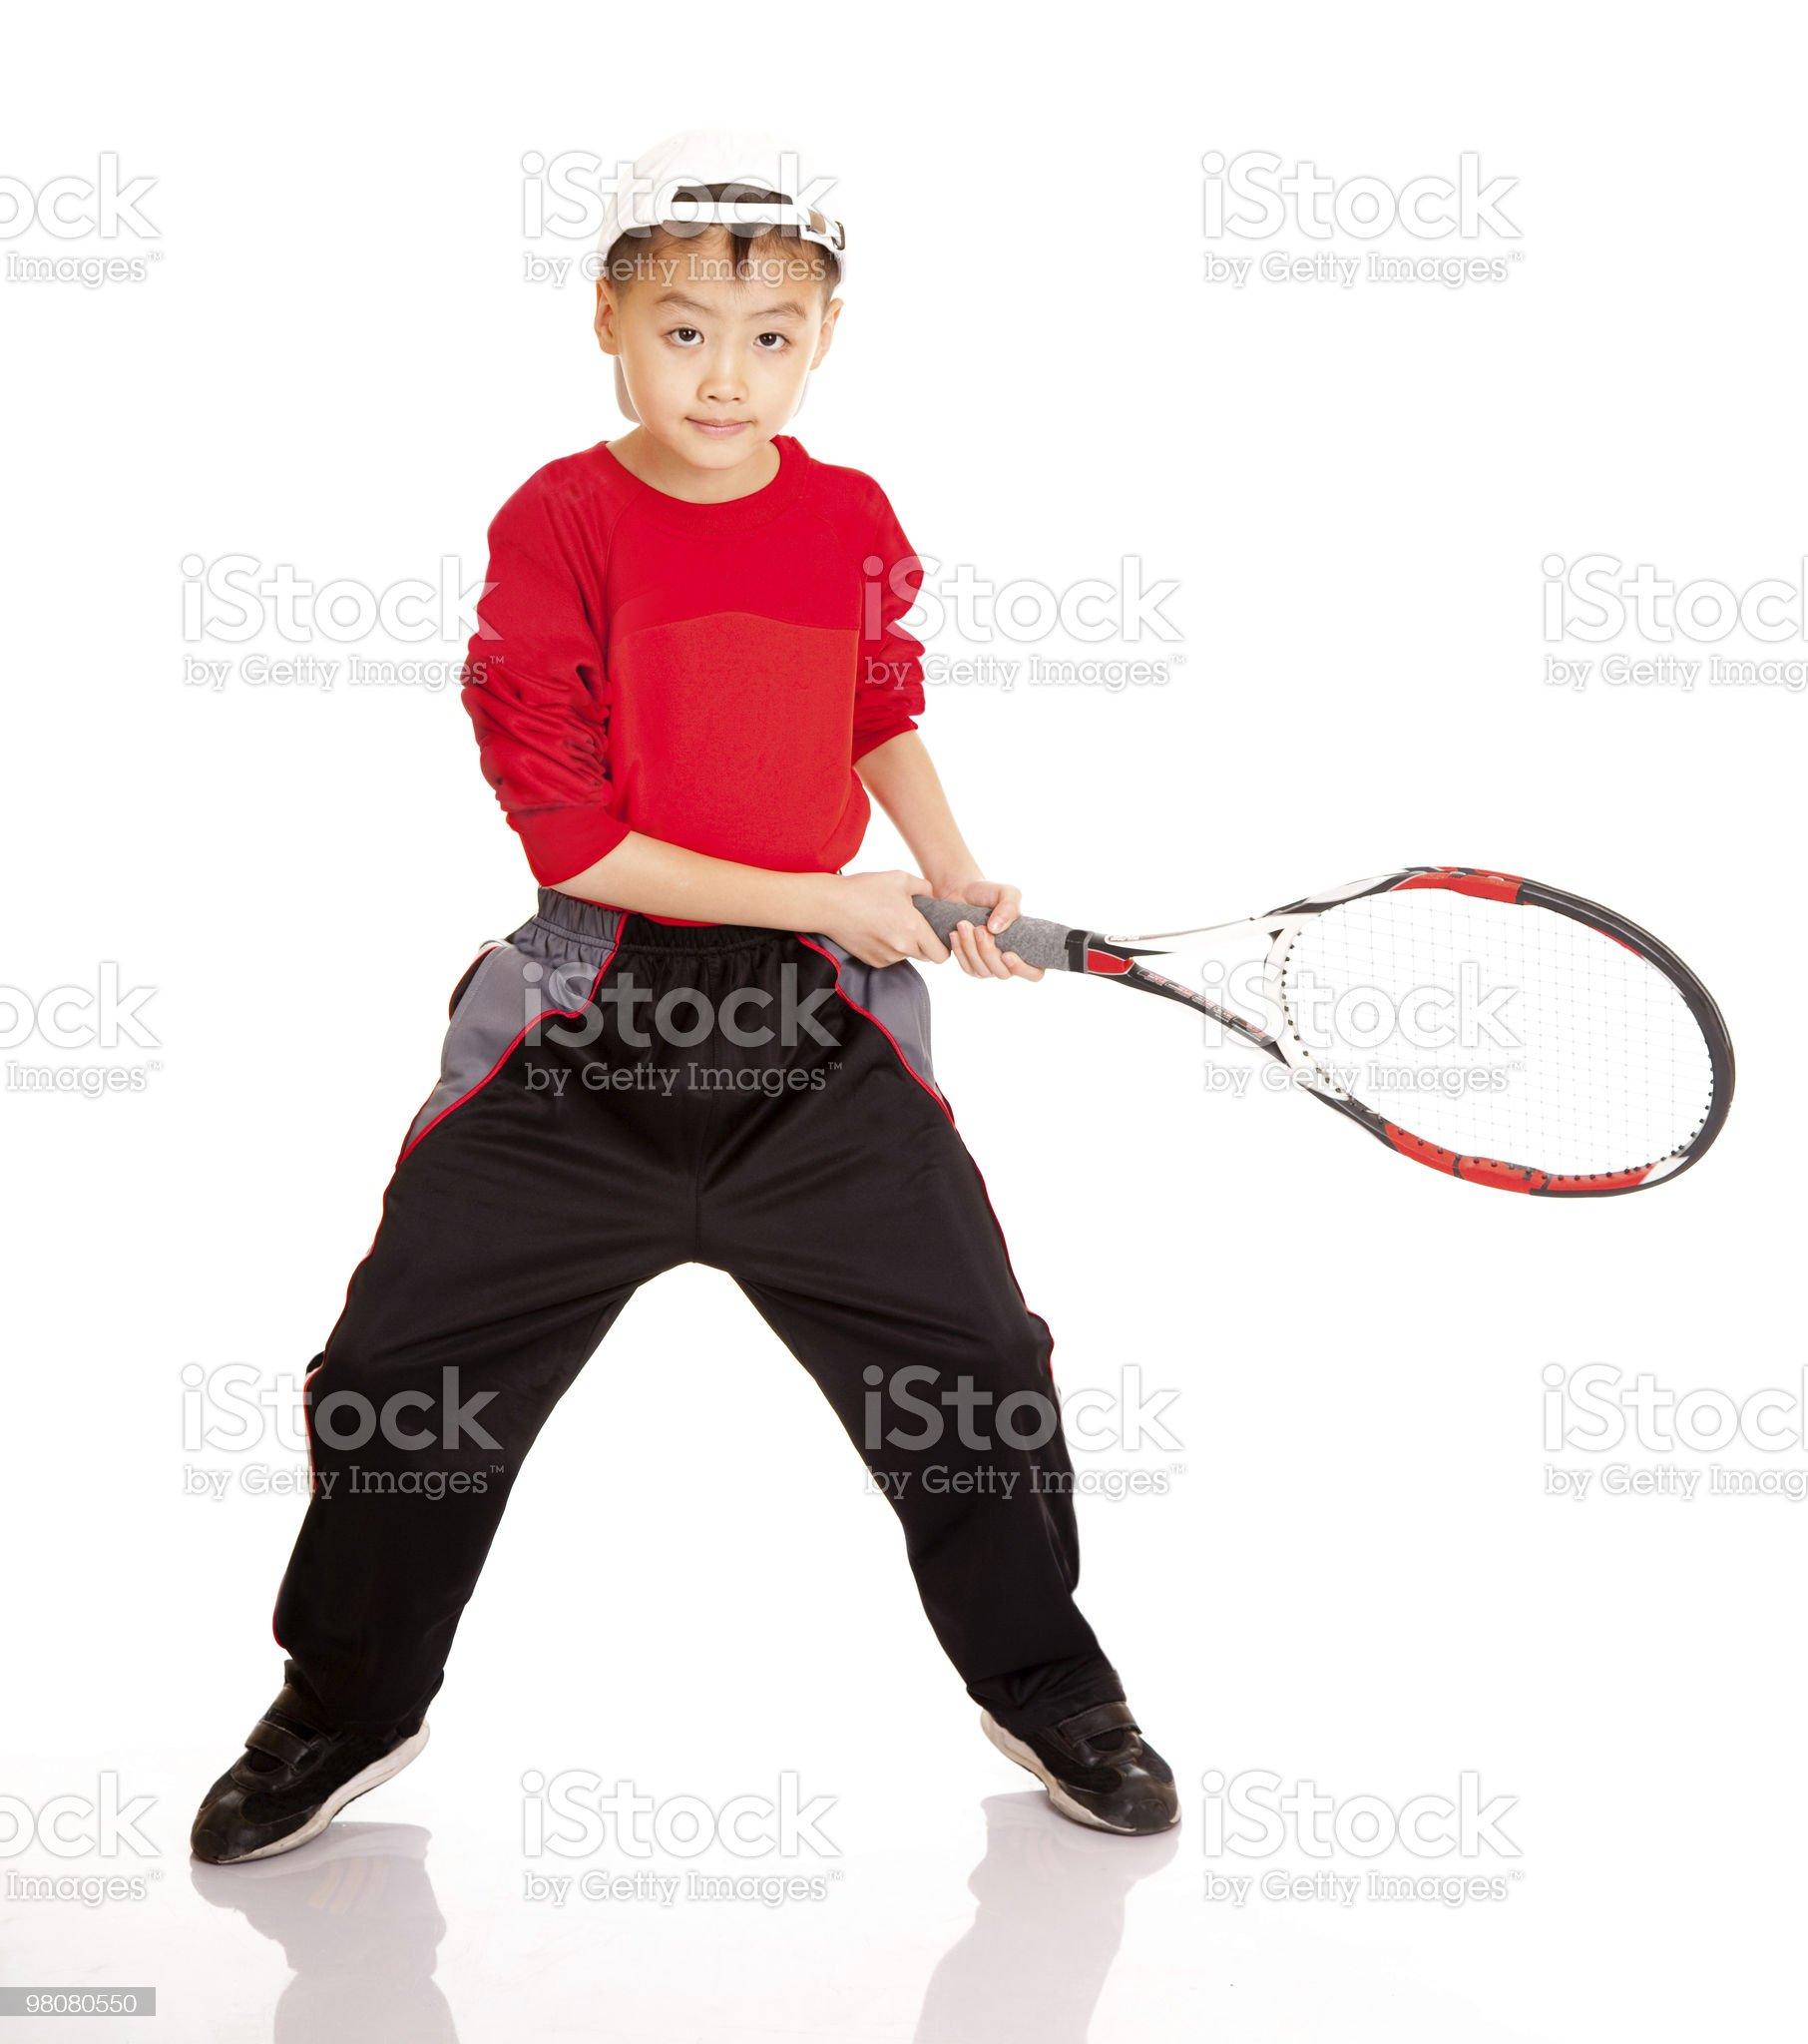 tennis boy royalty-free stock photo